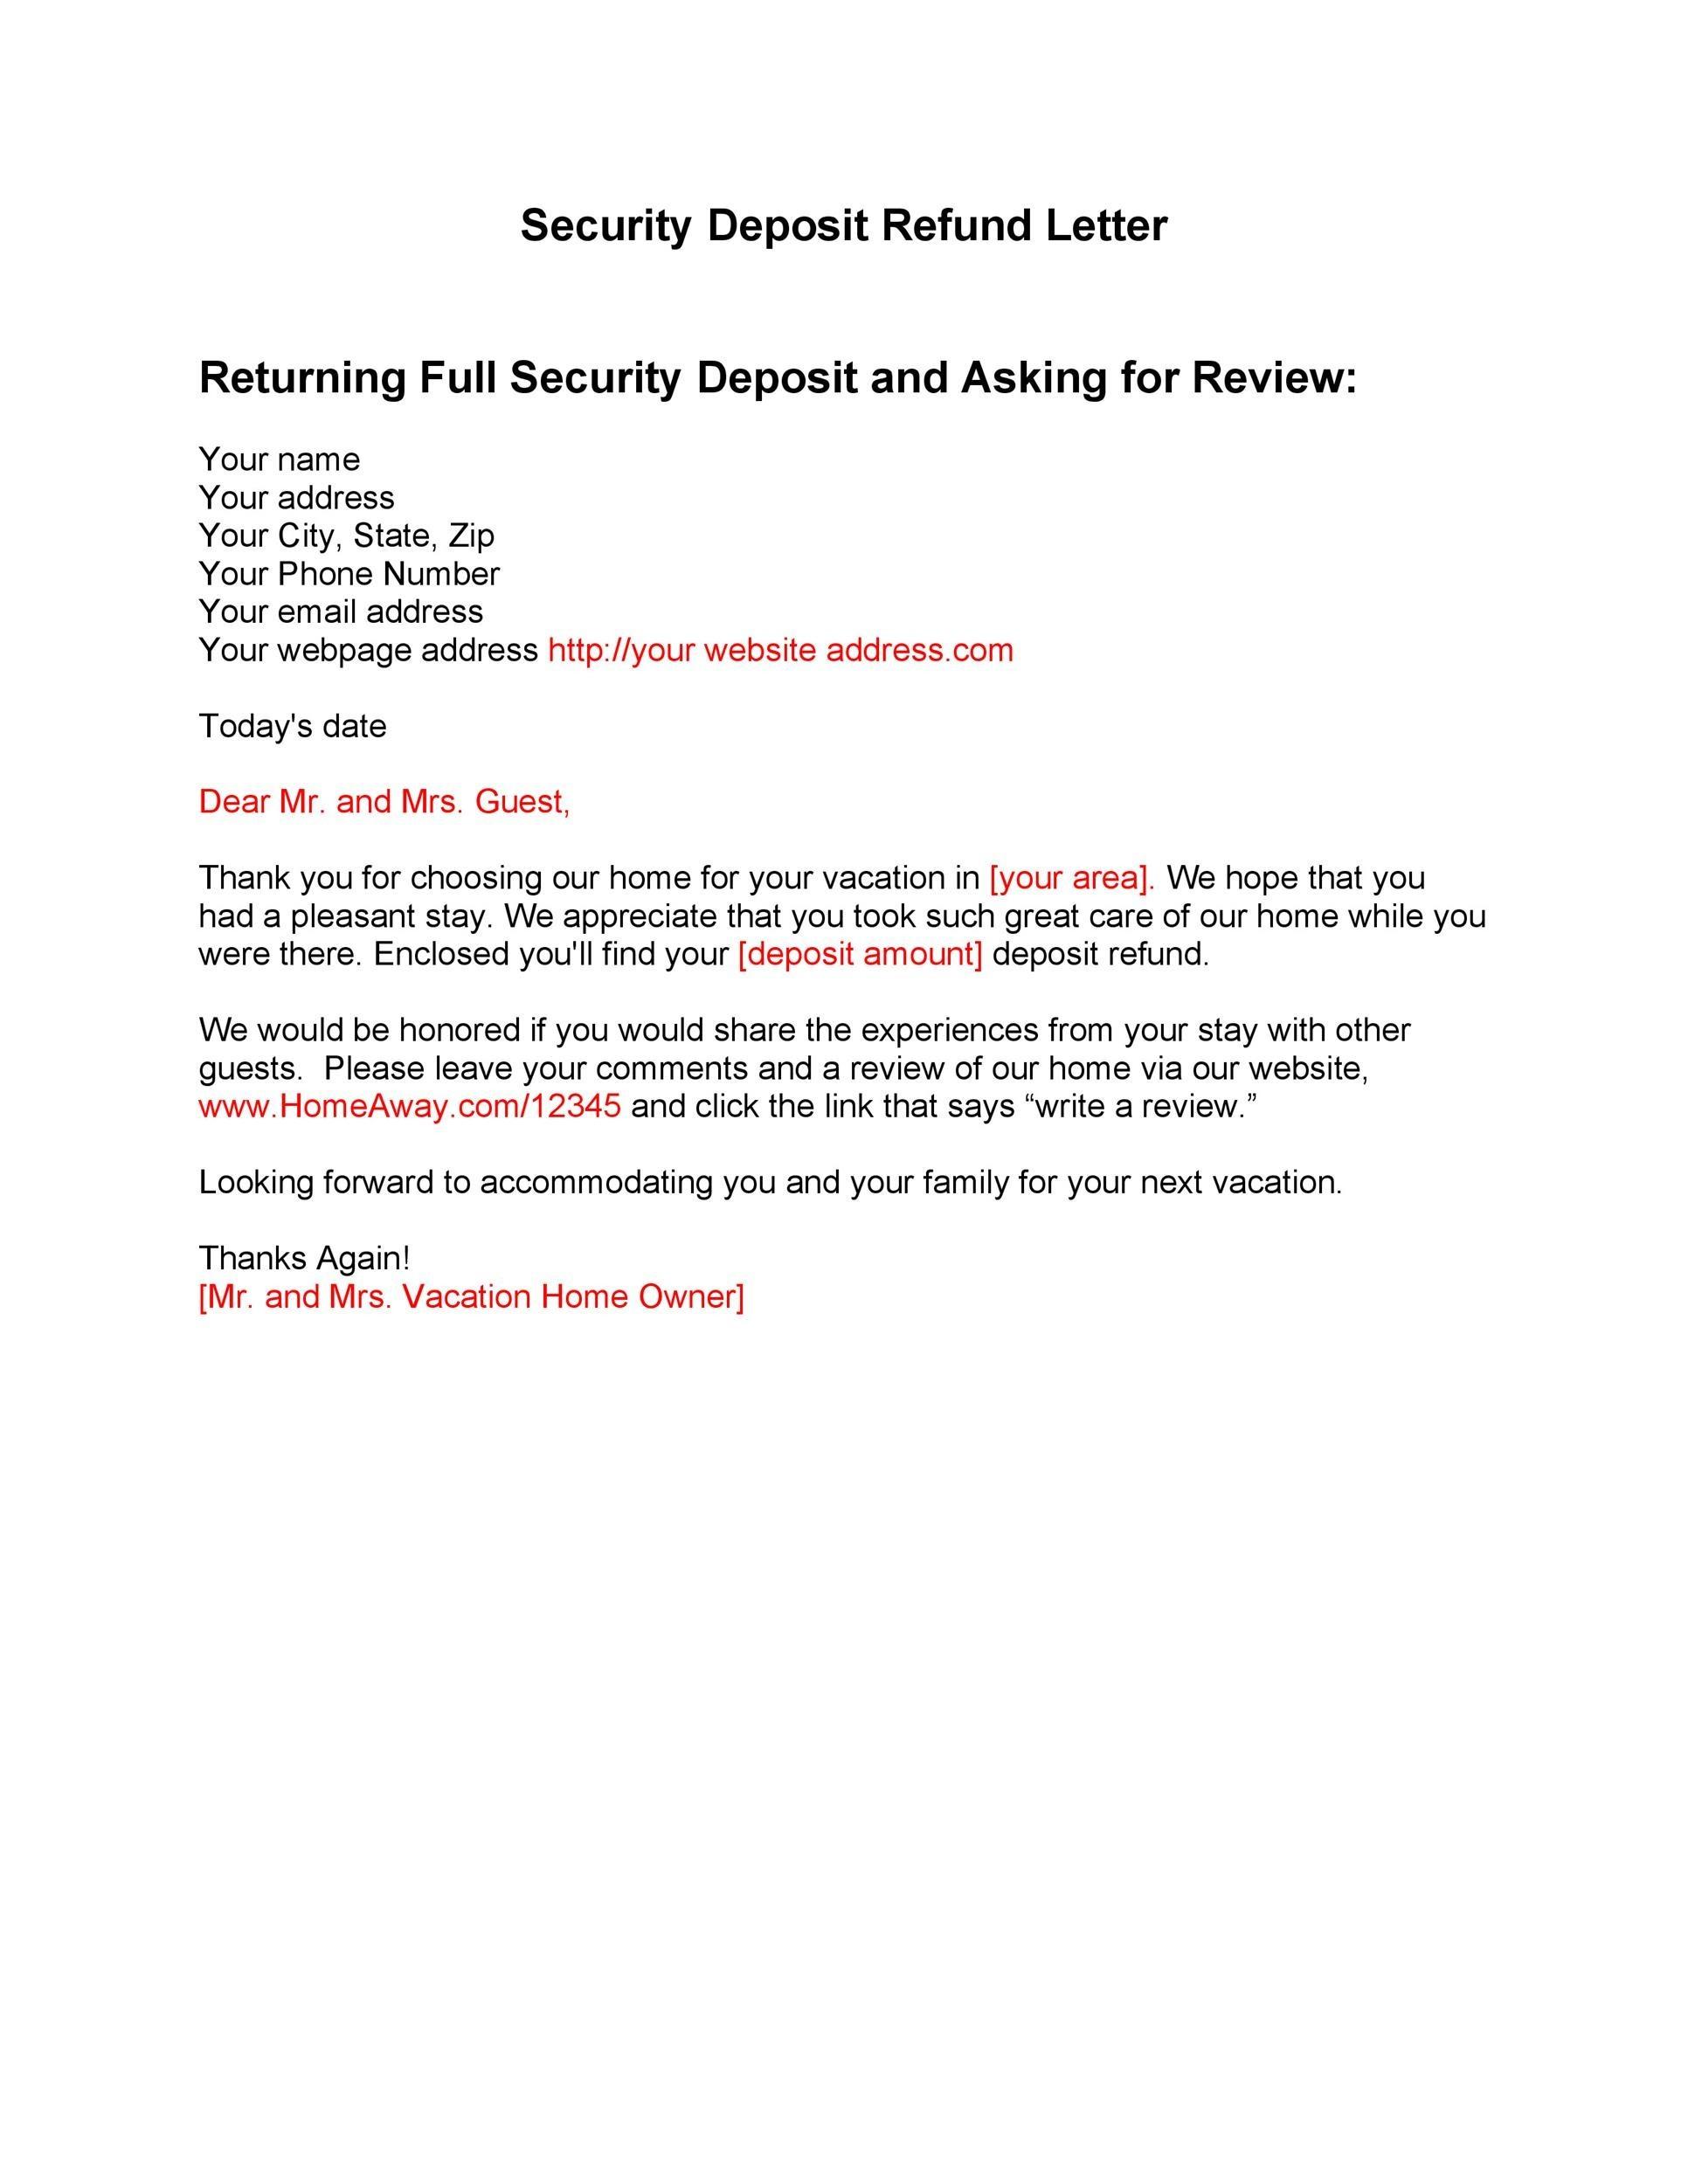 Free security deposit return letter 02